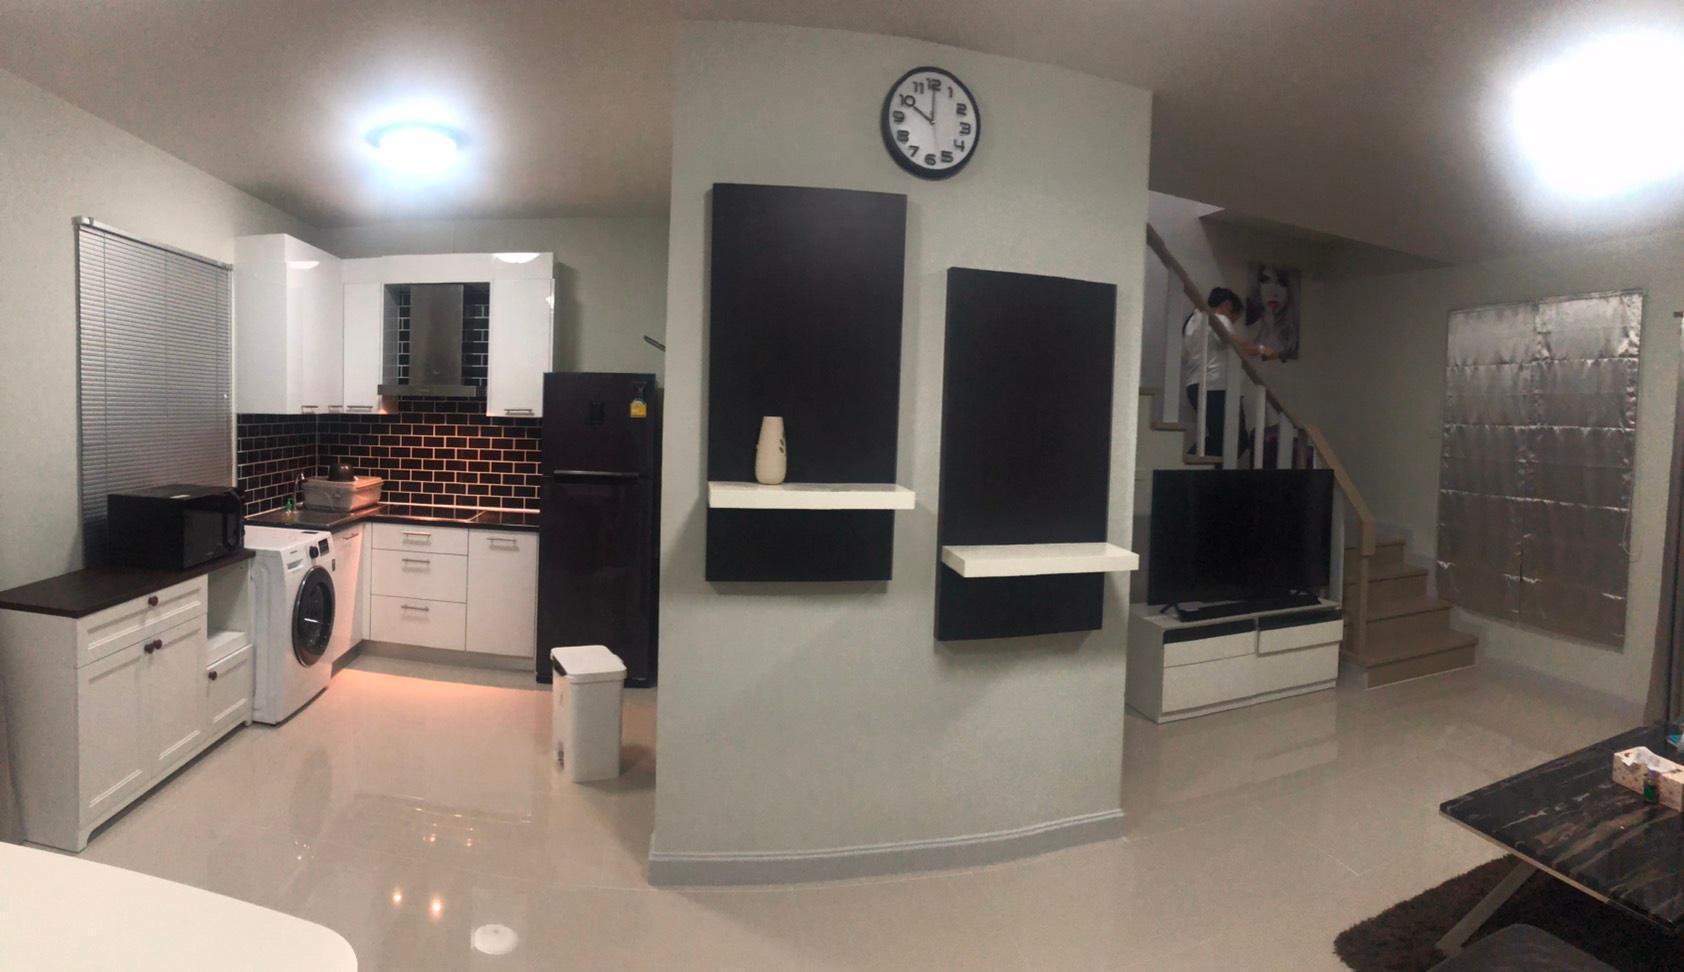 MM Home Service Full Home Facilities บ้านเดี่ยว 3 ห้องนอน 2 ห้องน้ำส่วนตัว ขนาด 120 ตร.ม. – สนามบินเชียงใหม่